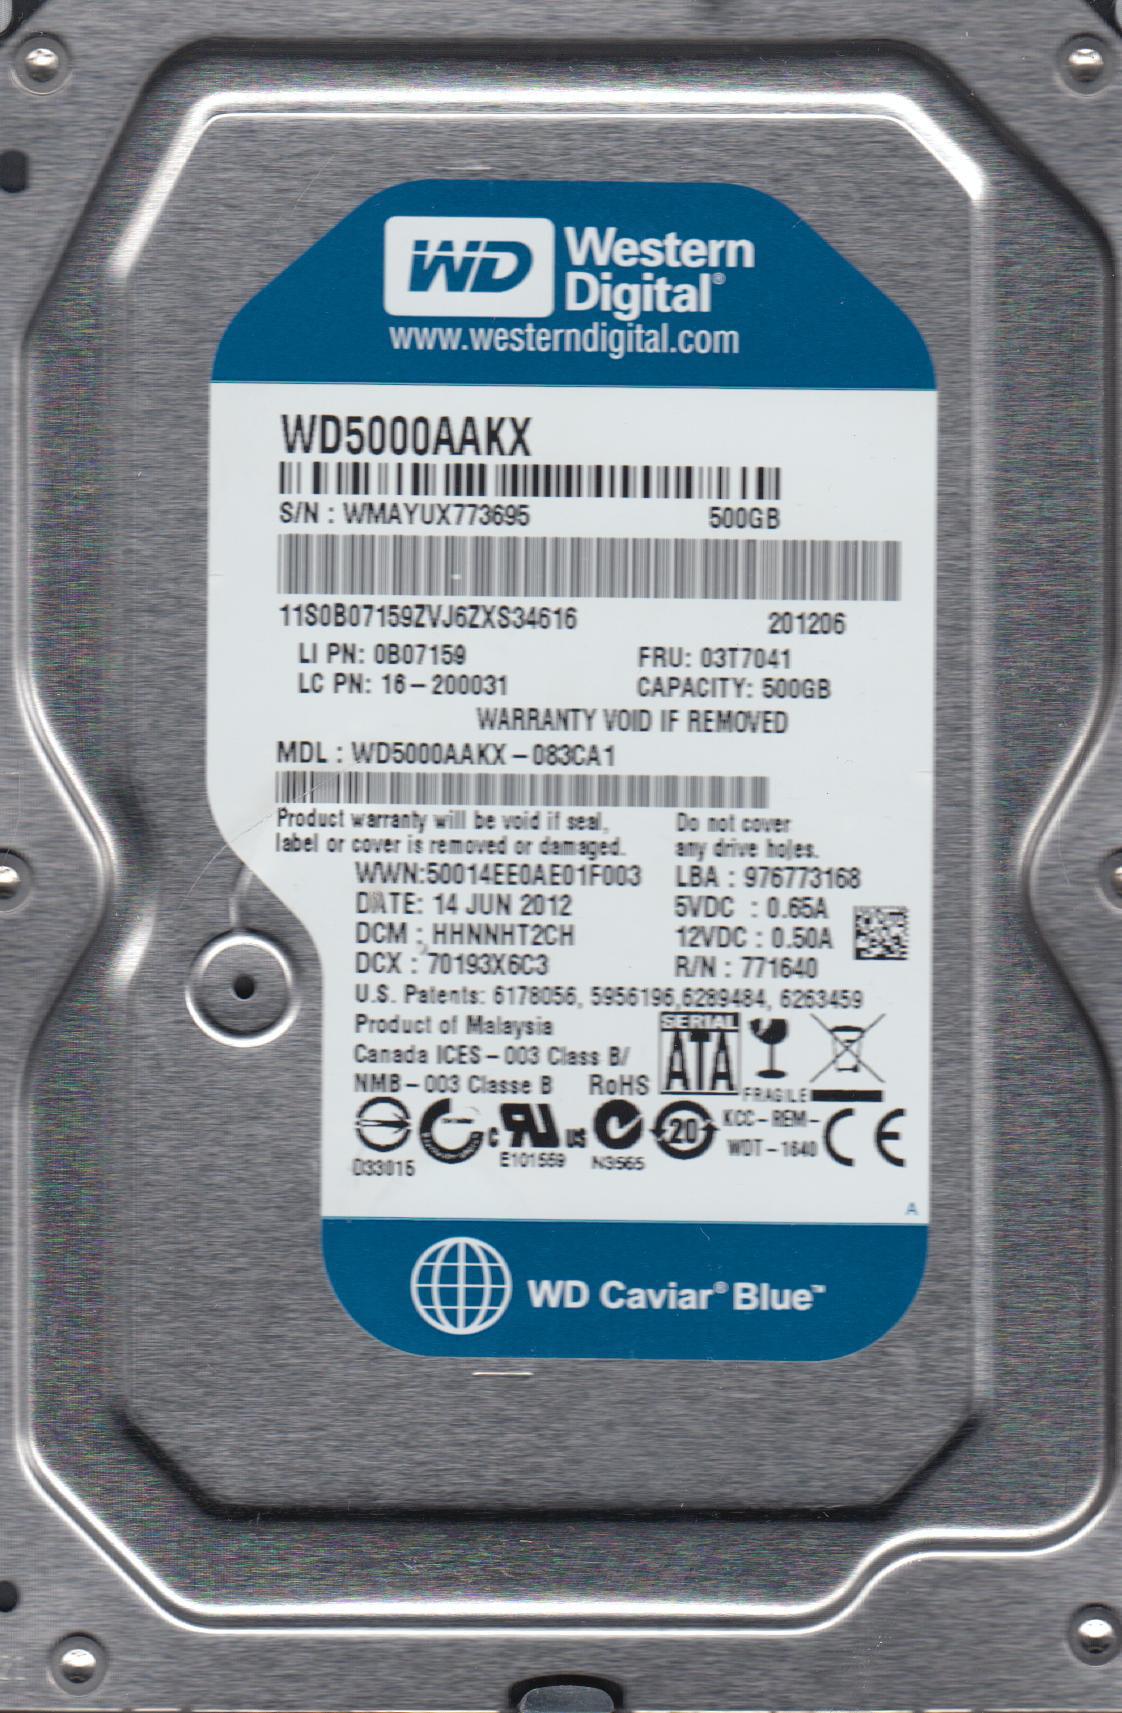 WD5000AAKX-083CA1, DCM HHNNHT2CH, Western Digital 500GB SATA 3.5 Hard Drive by WD